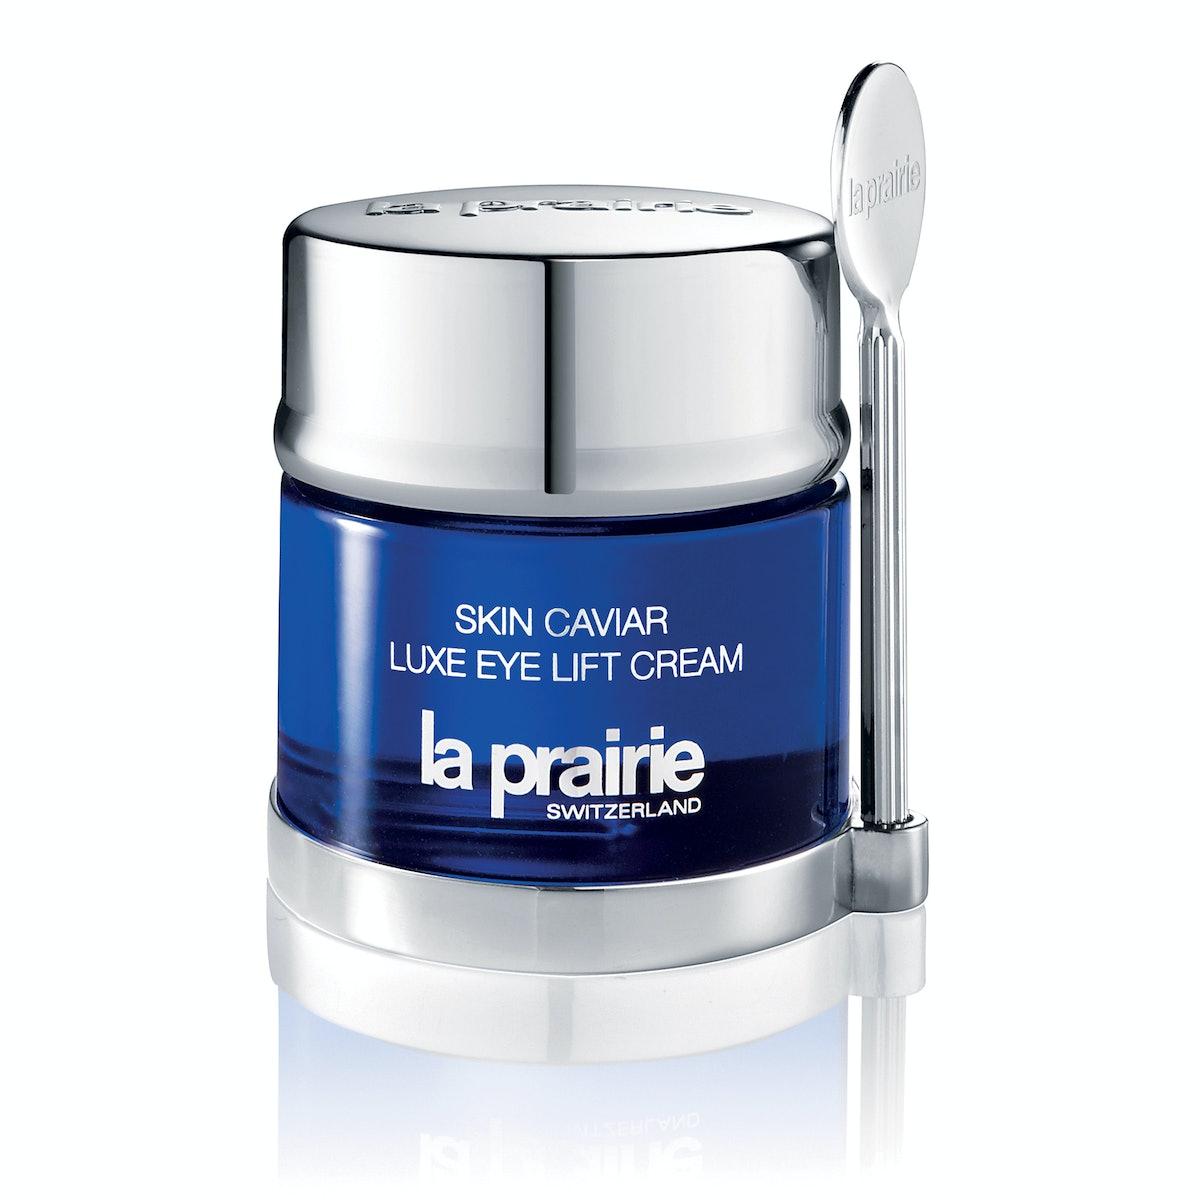 La Prairie Caviar Classic holiday set (cream, eye cream